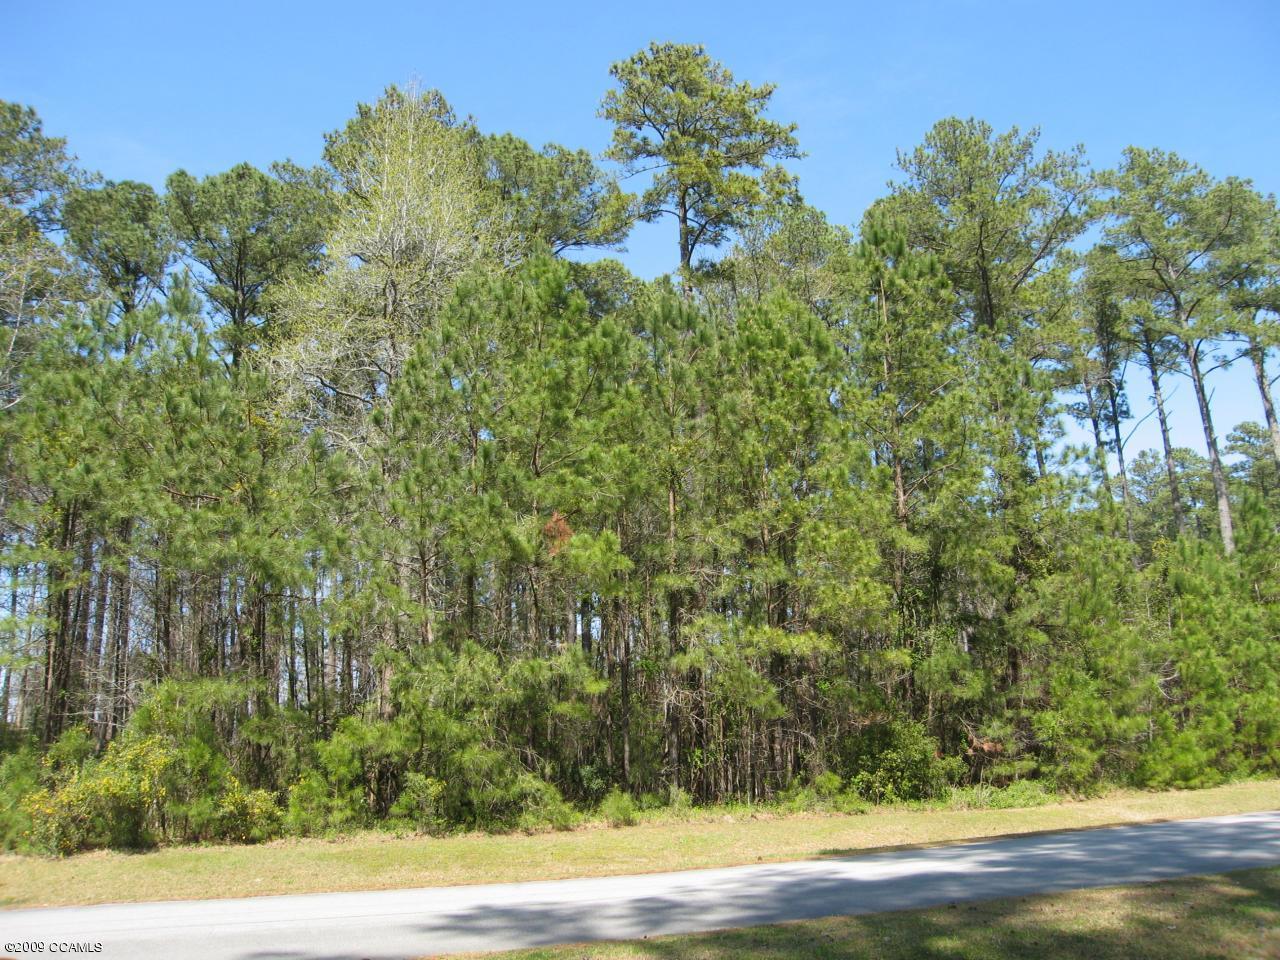 144 Cummins Creek Road, Beaufort, North Carolina 28516, ,Residential land,For sale,Cummins Creek,100117629